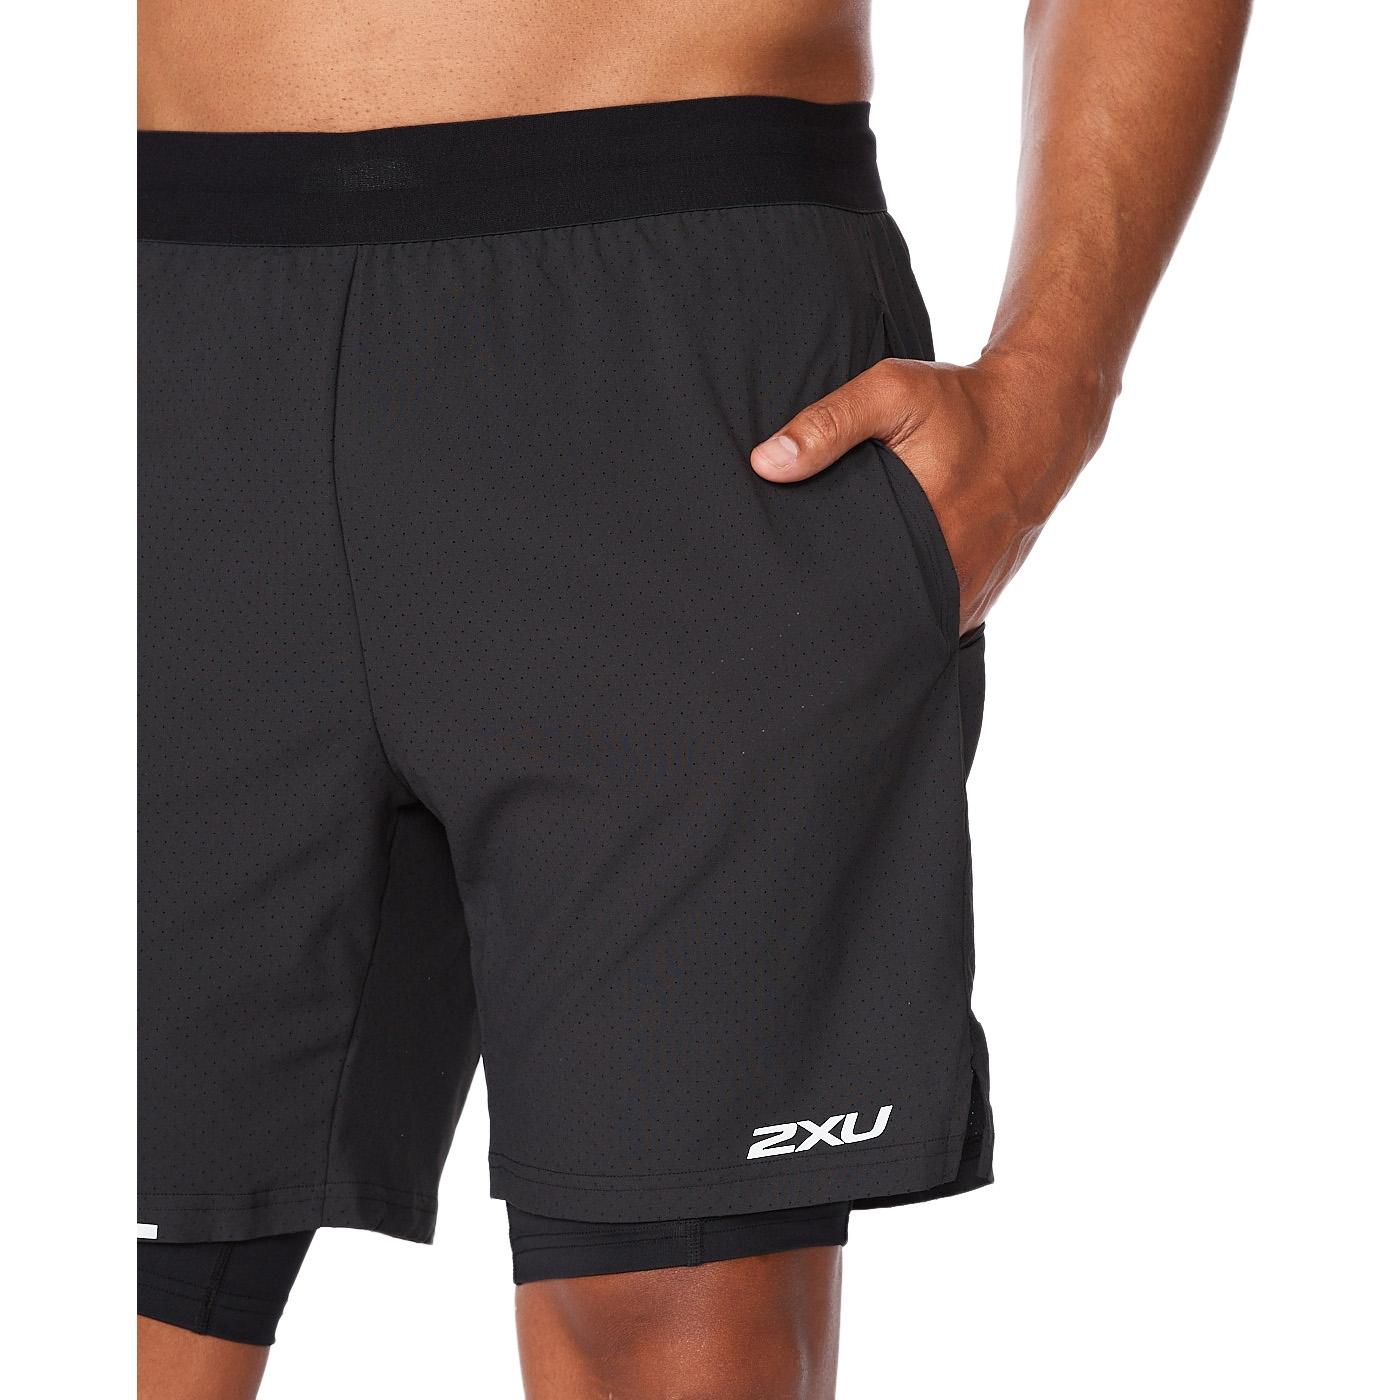 "Imagen de 2XU Aero 2-In-1 7"" Pantalon corto de correr - black/silver reflective"